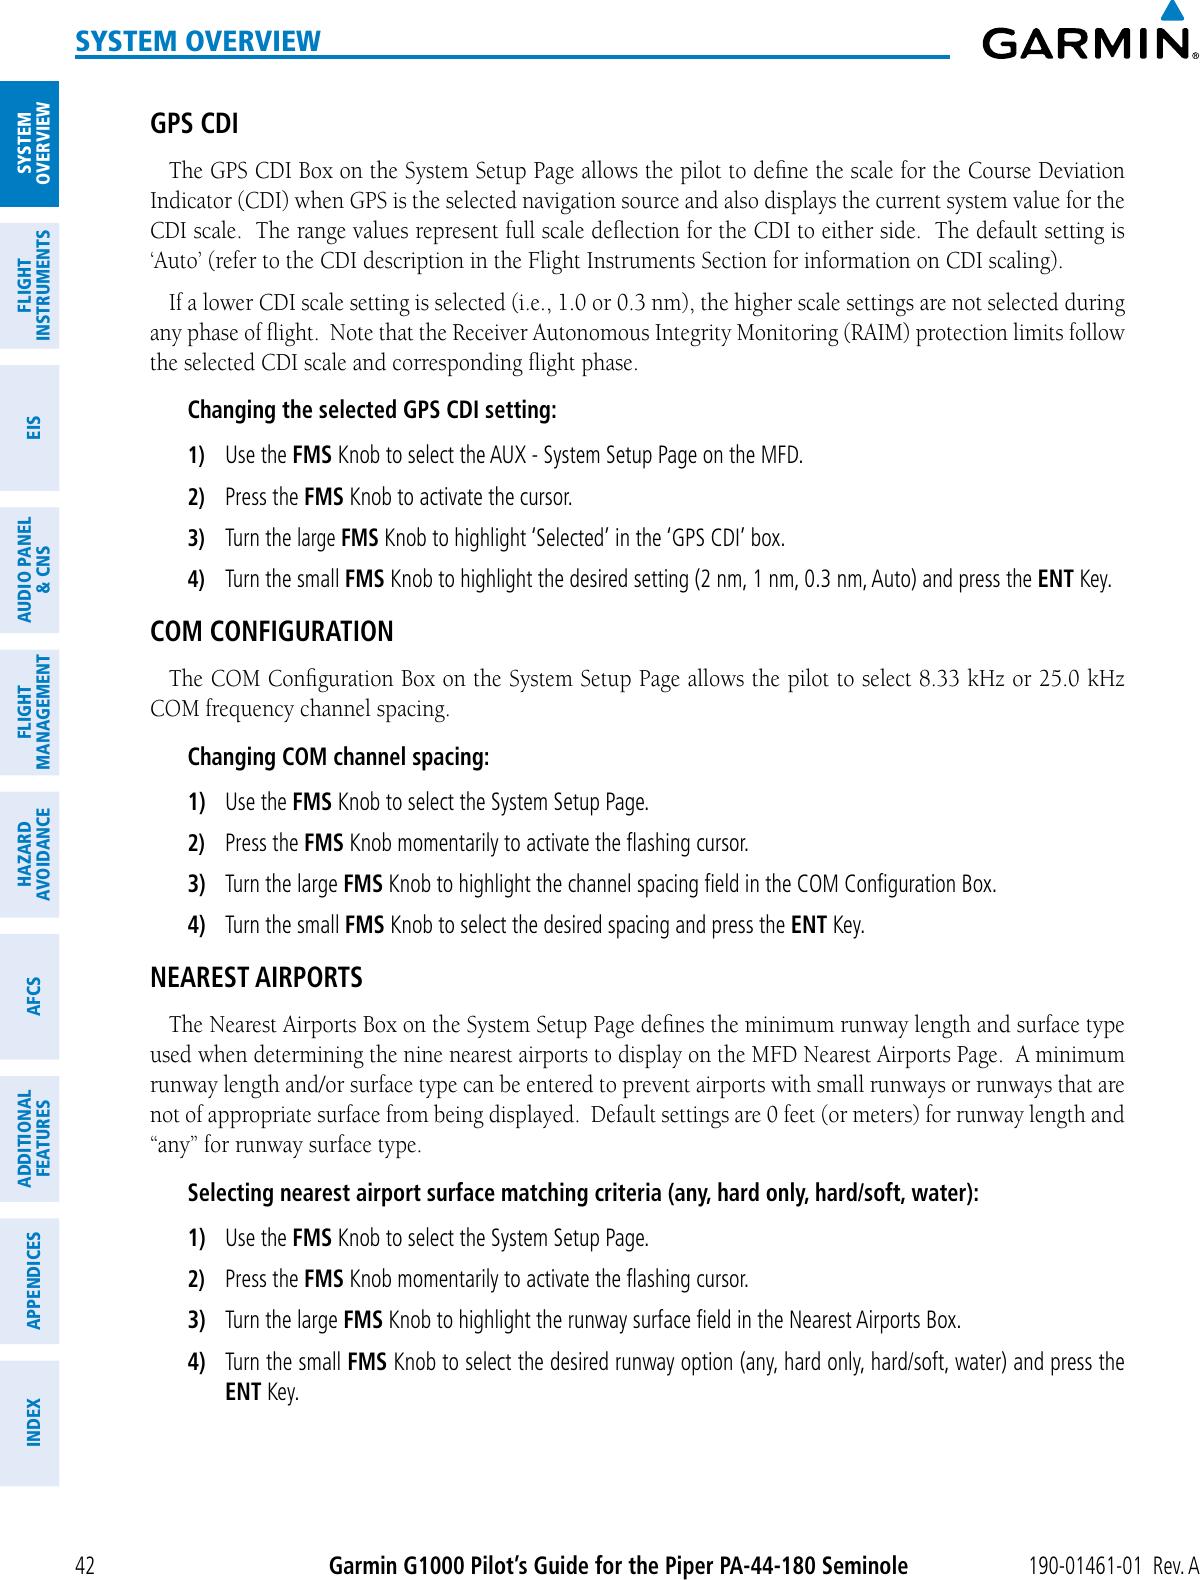 Garmin Software Version 1983 00 Pilots Guide